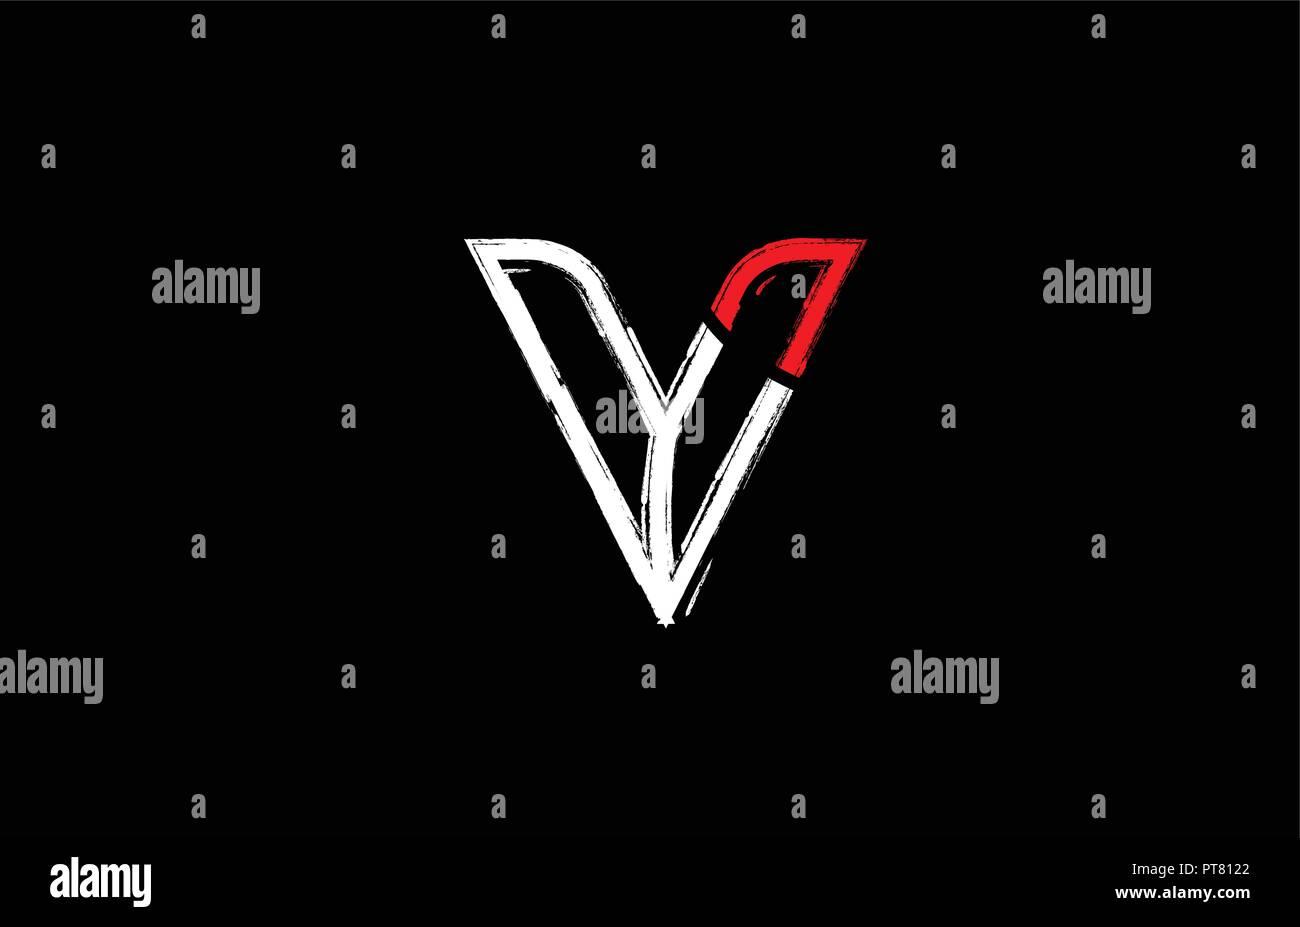 Grunge Alphabet Letter V Logo Design In White Red And Black Colors